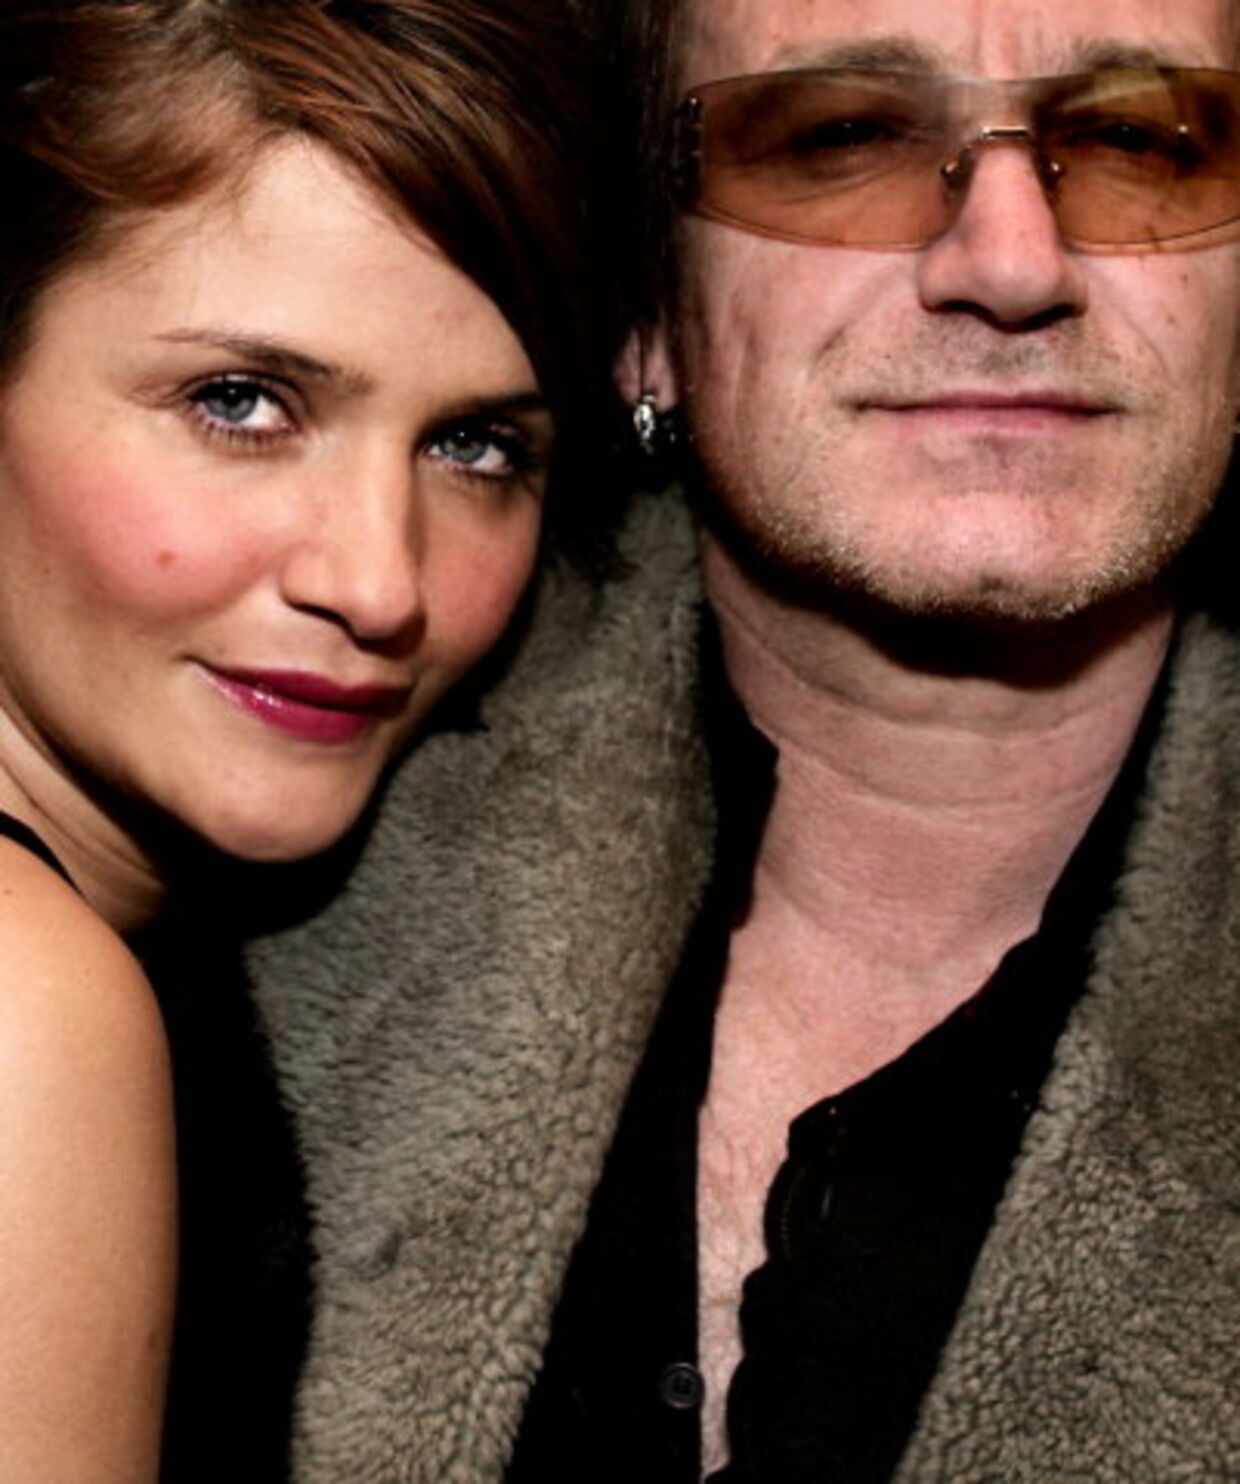 Helena Christensen og U2s forsanger Bono er gode vennner og ses ofte. Her er de fotograferet sammen, da de i januar var på restaurant »Era Ora« i København. Foto: Martin Sylvest